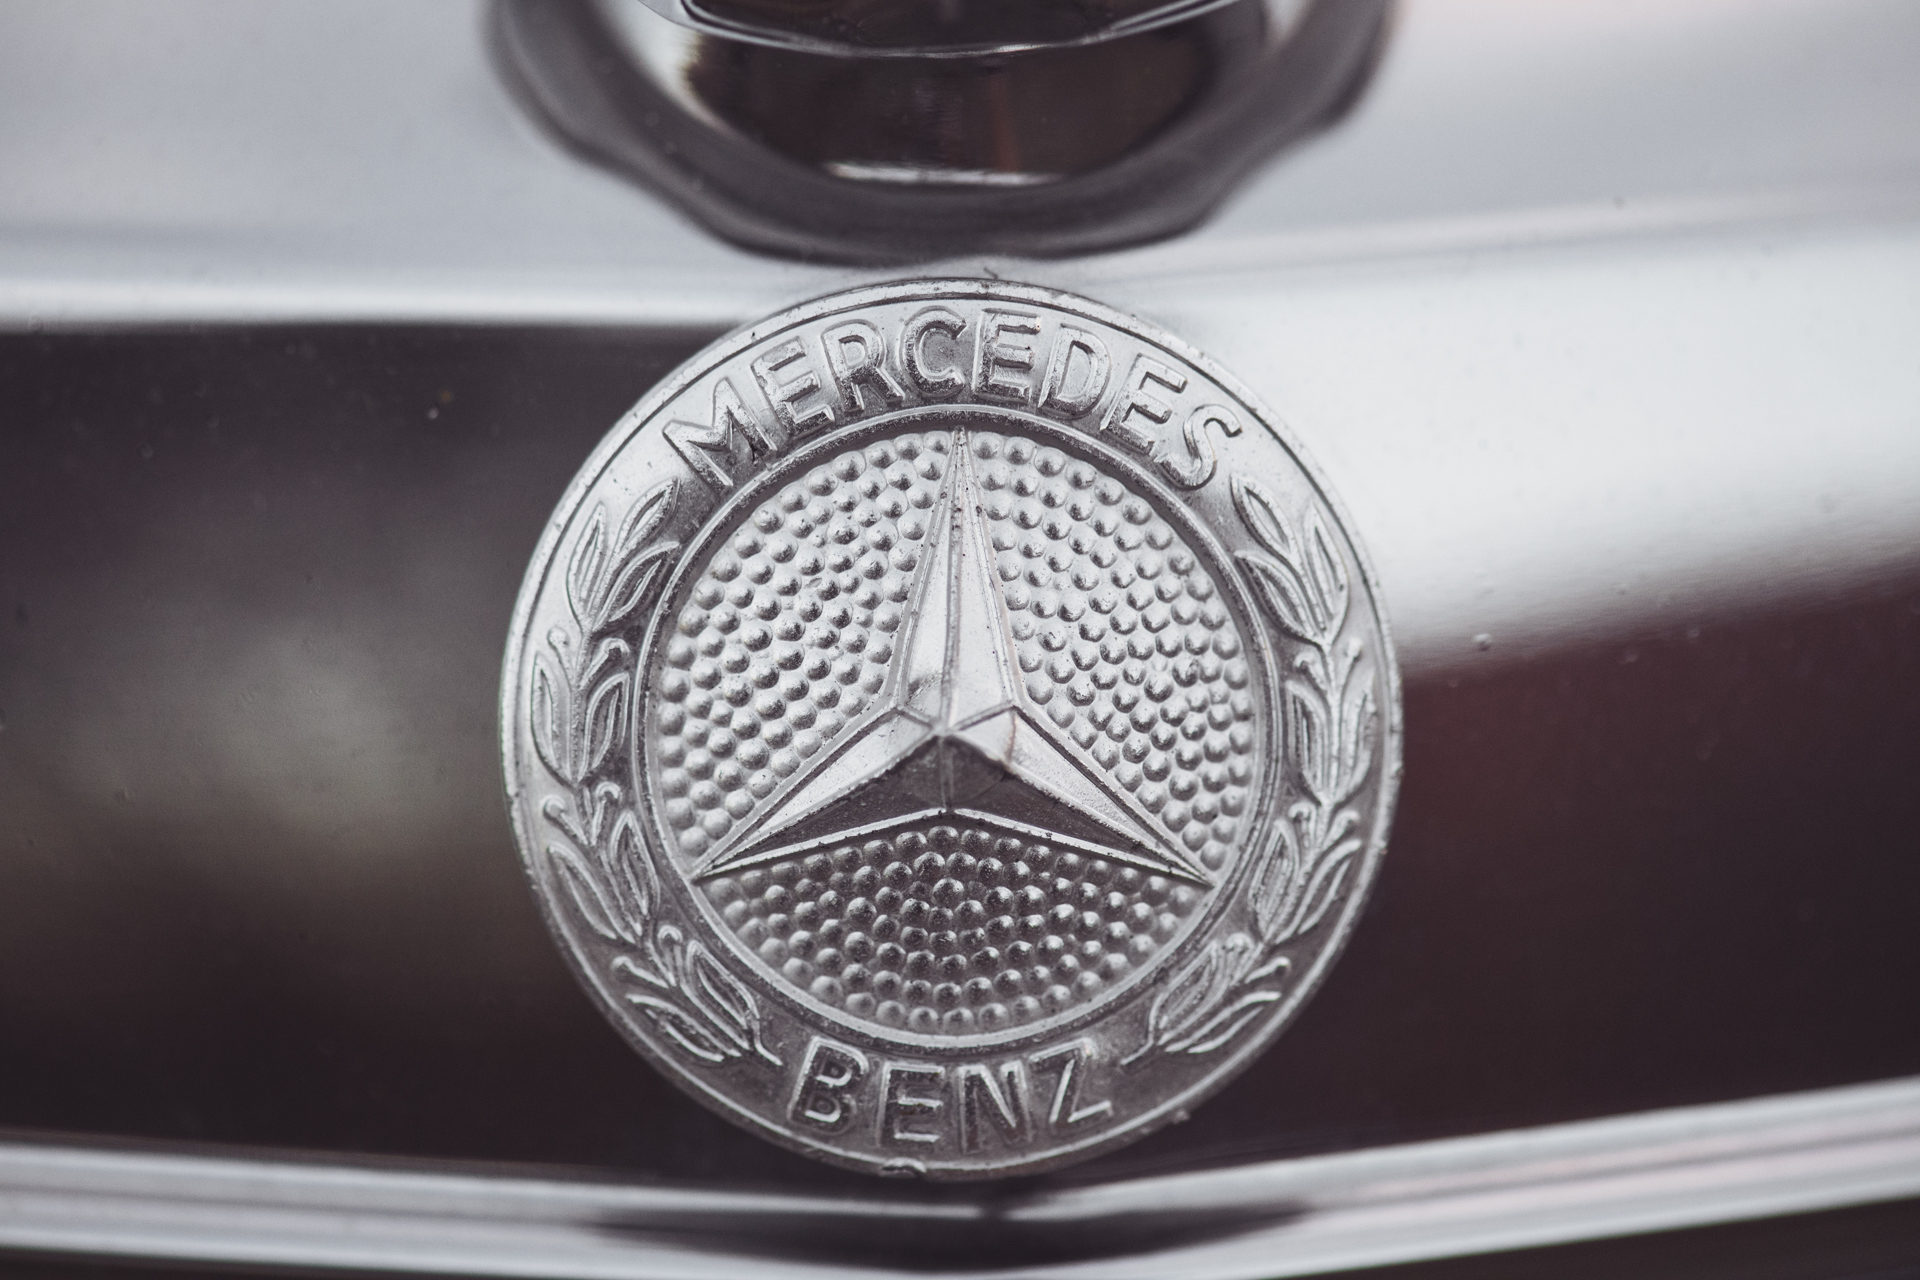 Mercedes240-17.jpg